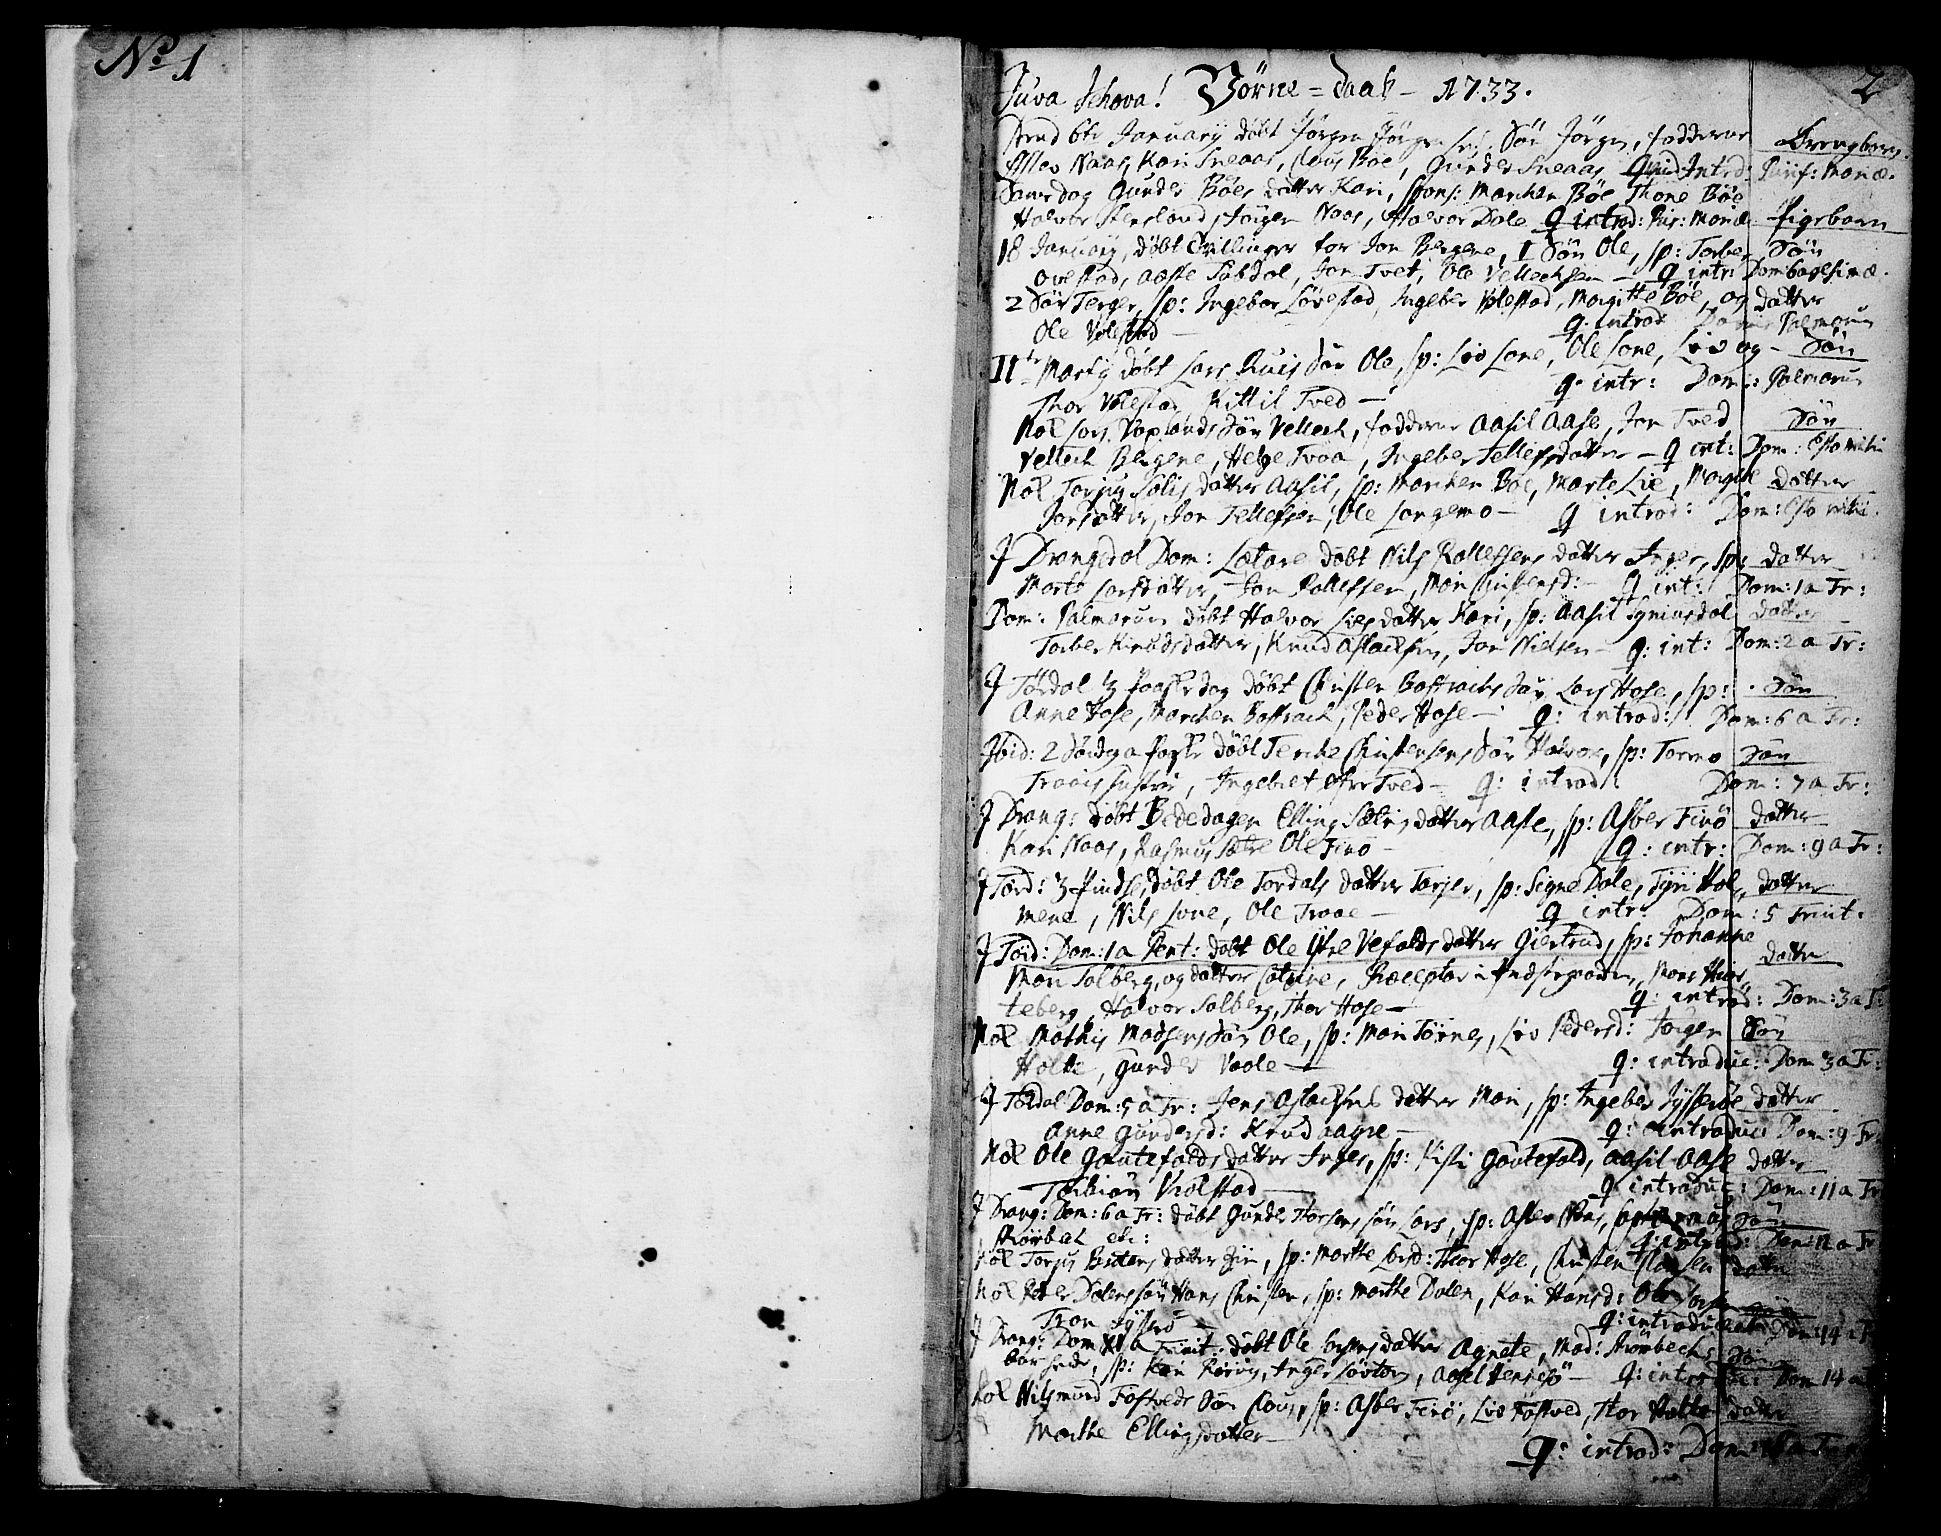 SAKO, Drangedal kirkebøker, F/Fa/L0002: Ministerialbok nr. 2, 1733-1753, s. 1-2